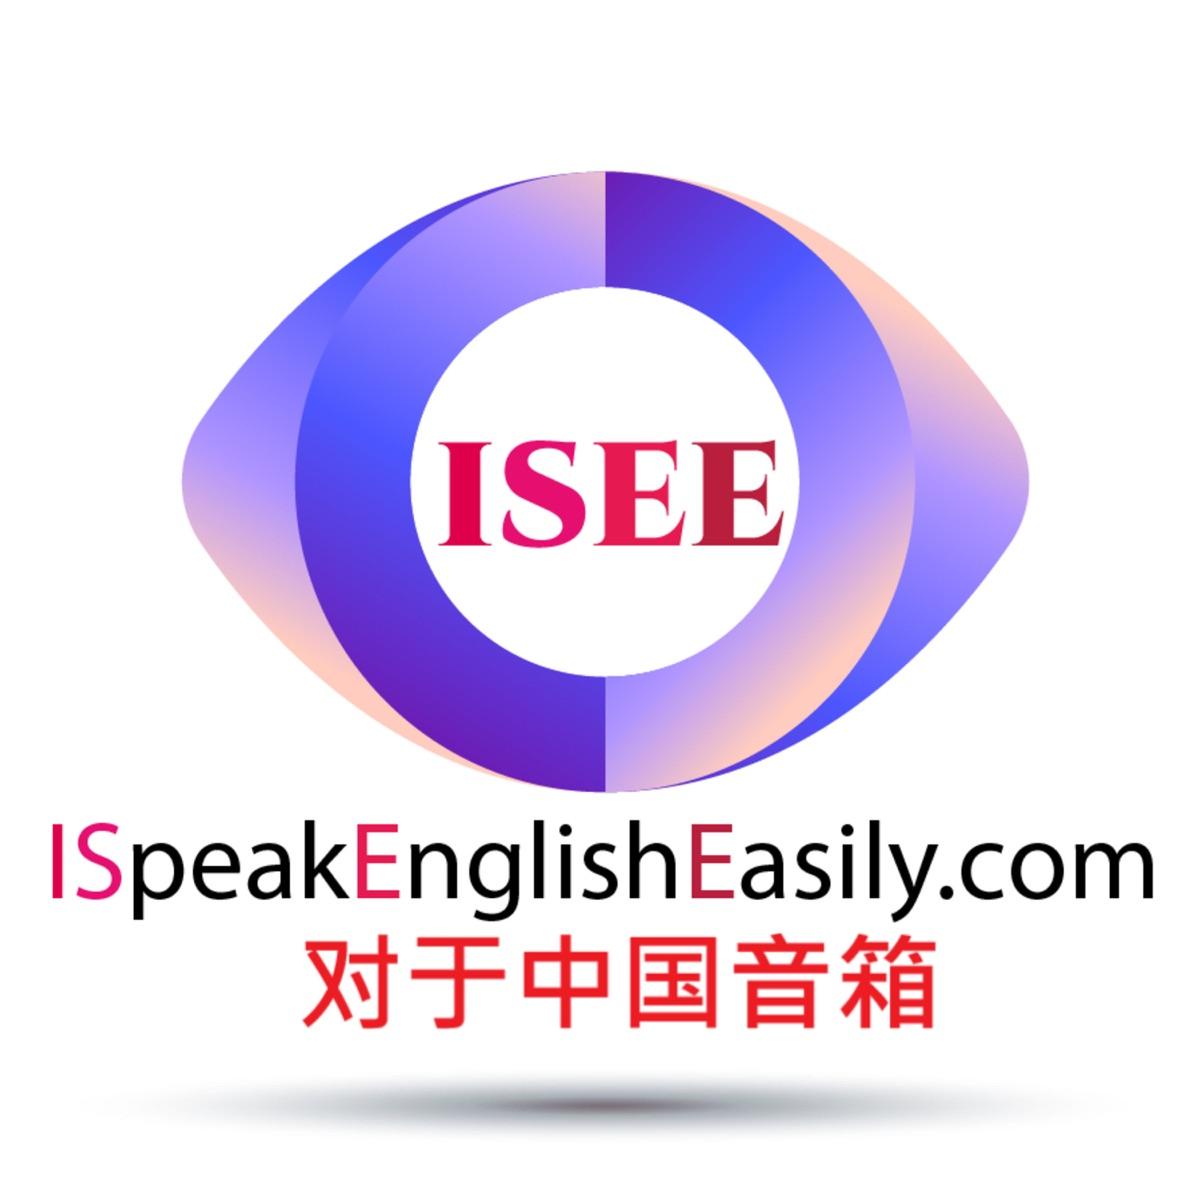 I Speak English Easily for Chinese speakers